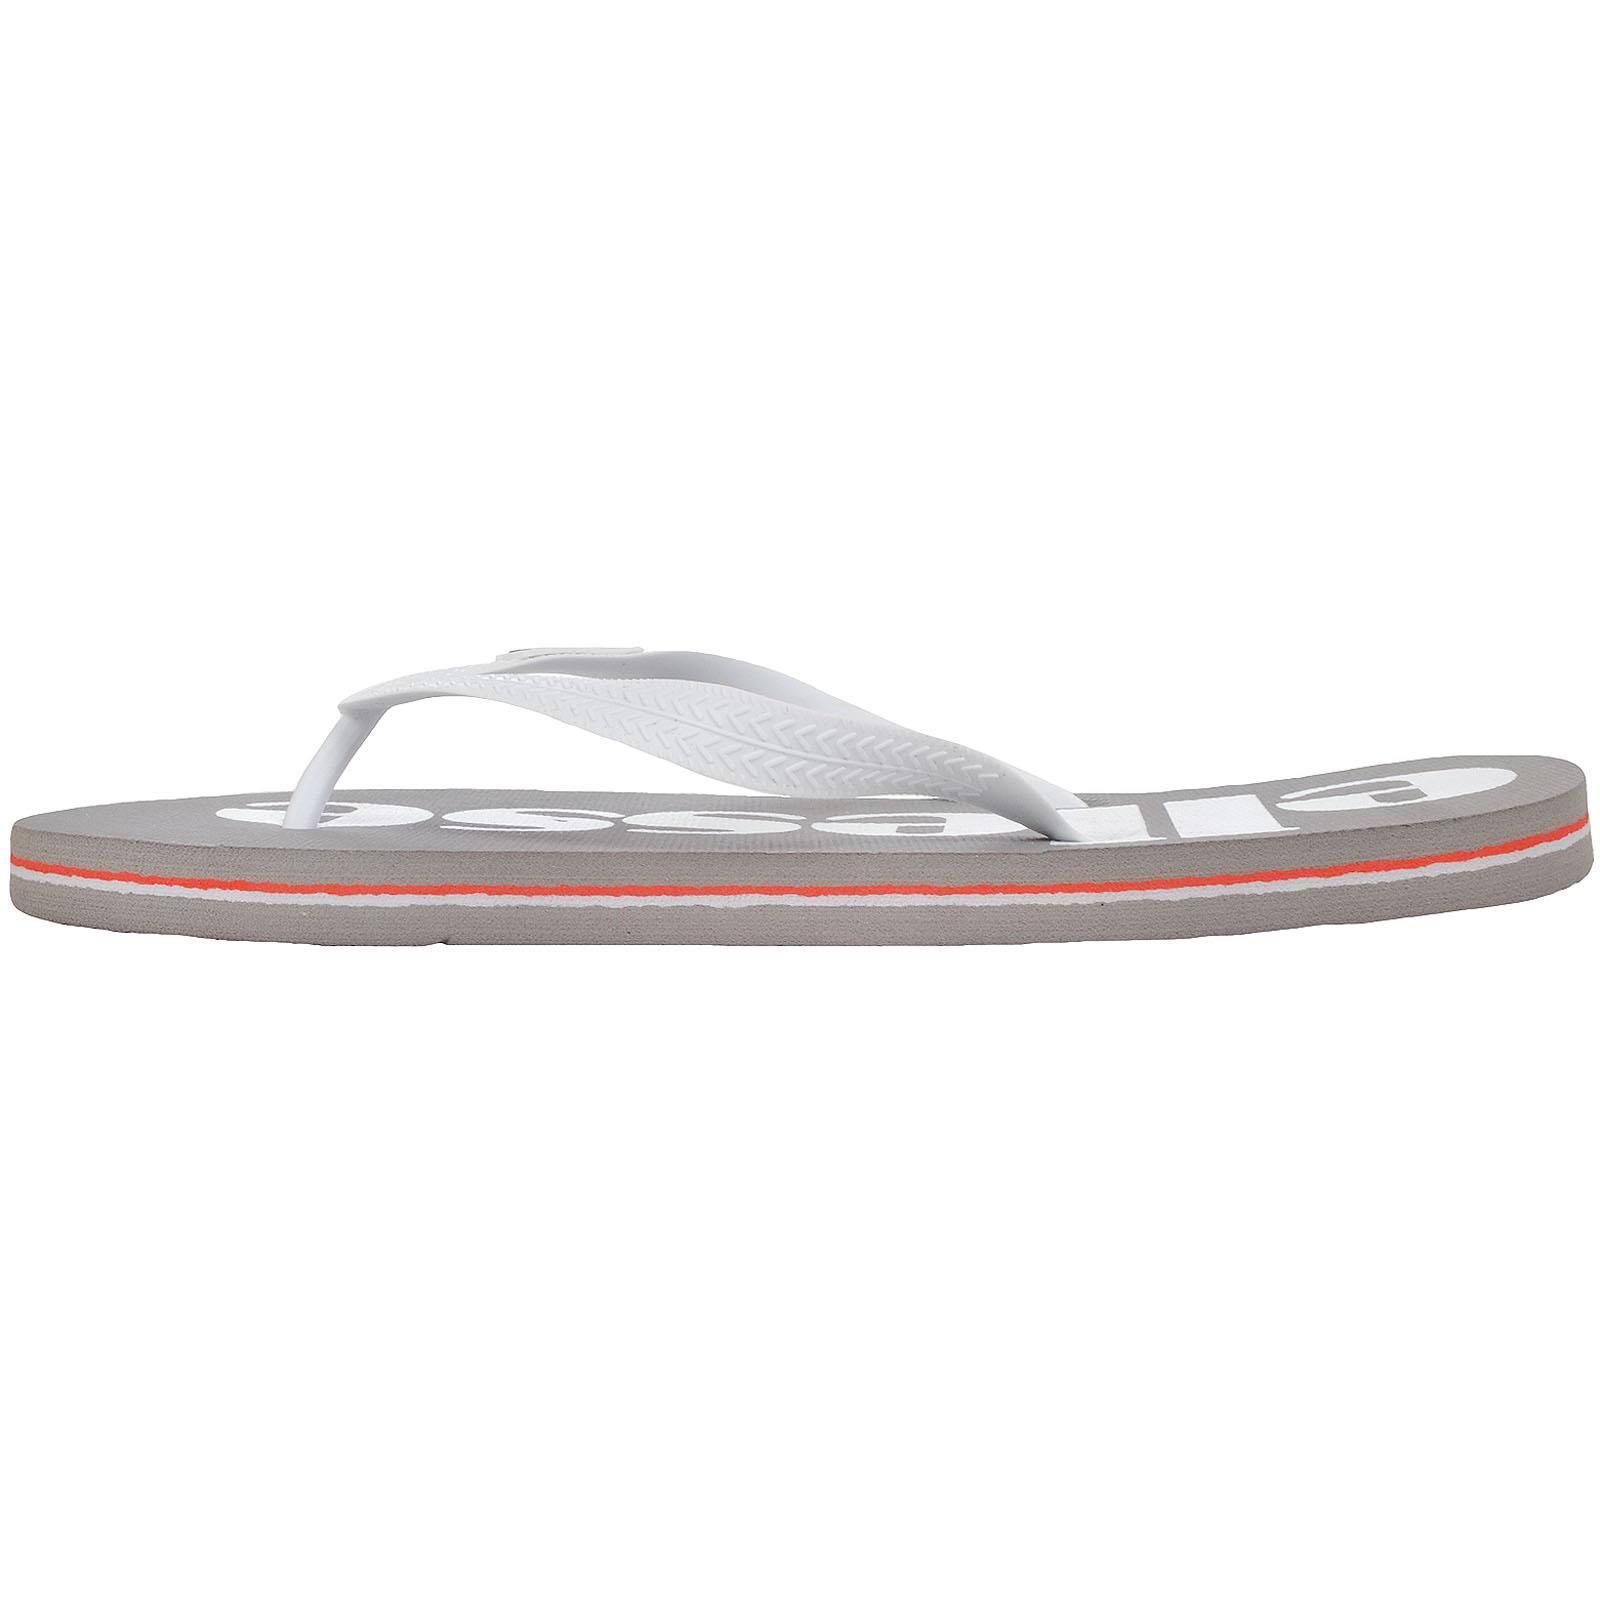 Ellesse-Mens-Marcos-Flip-Flops-Beach-Pool-Holiday-Slip-On-Sandals-Thongs thumbnail 12